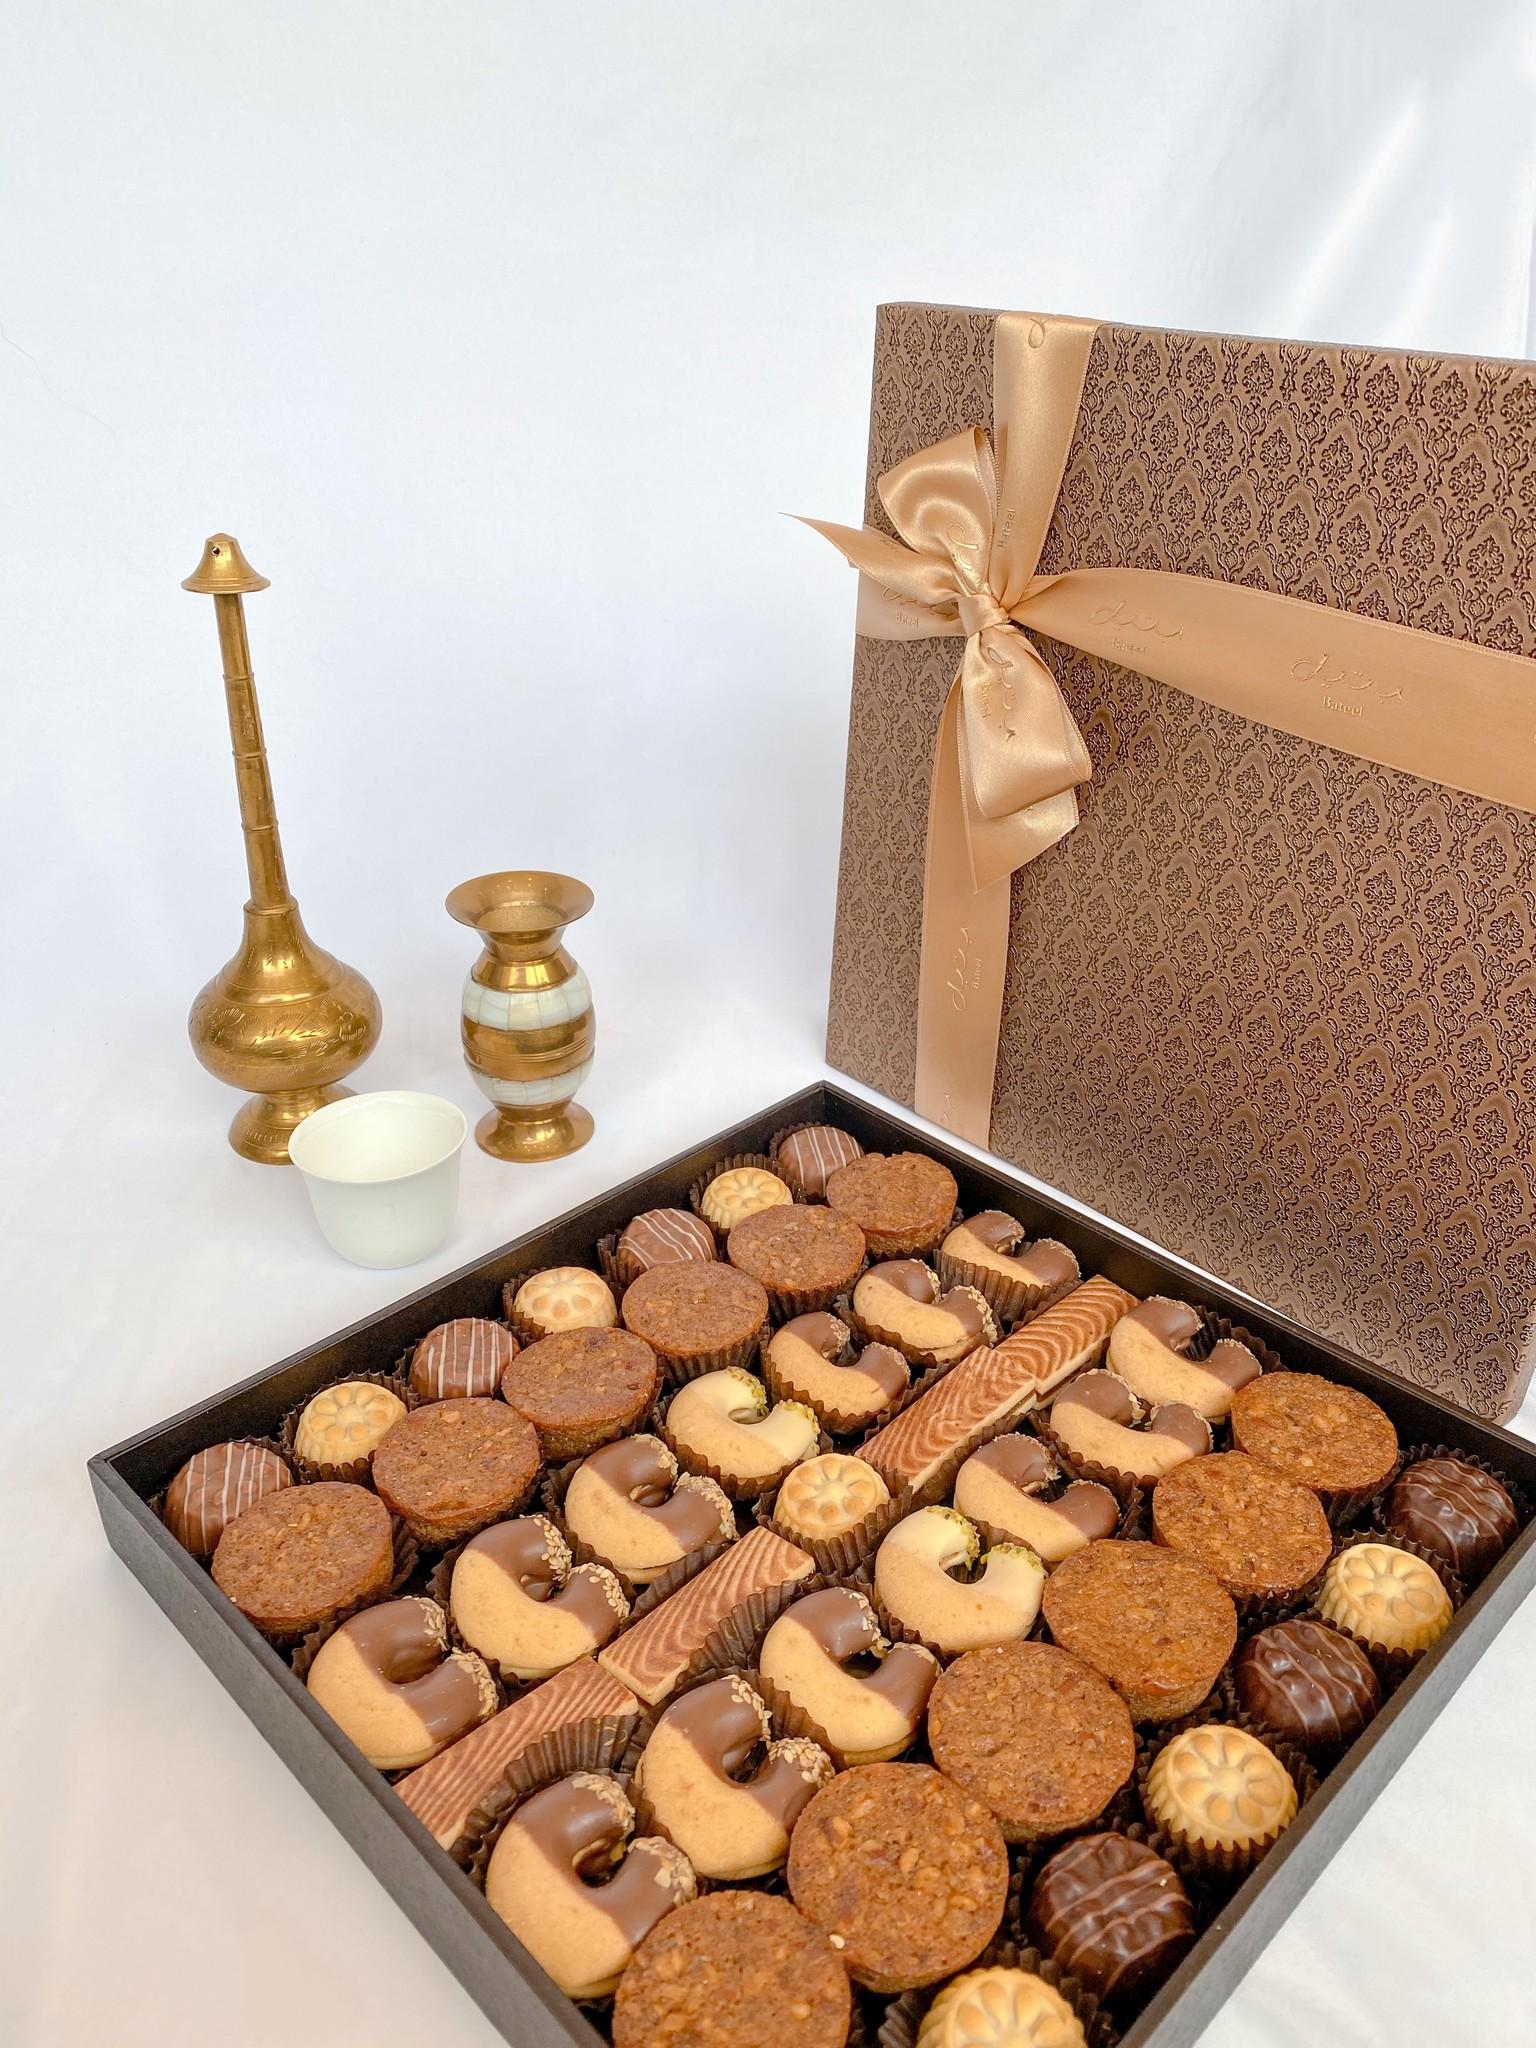 Bateel USA Mounira L Square Gourmet Biscuits Assortment